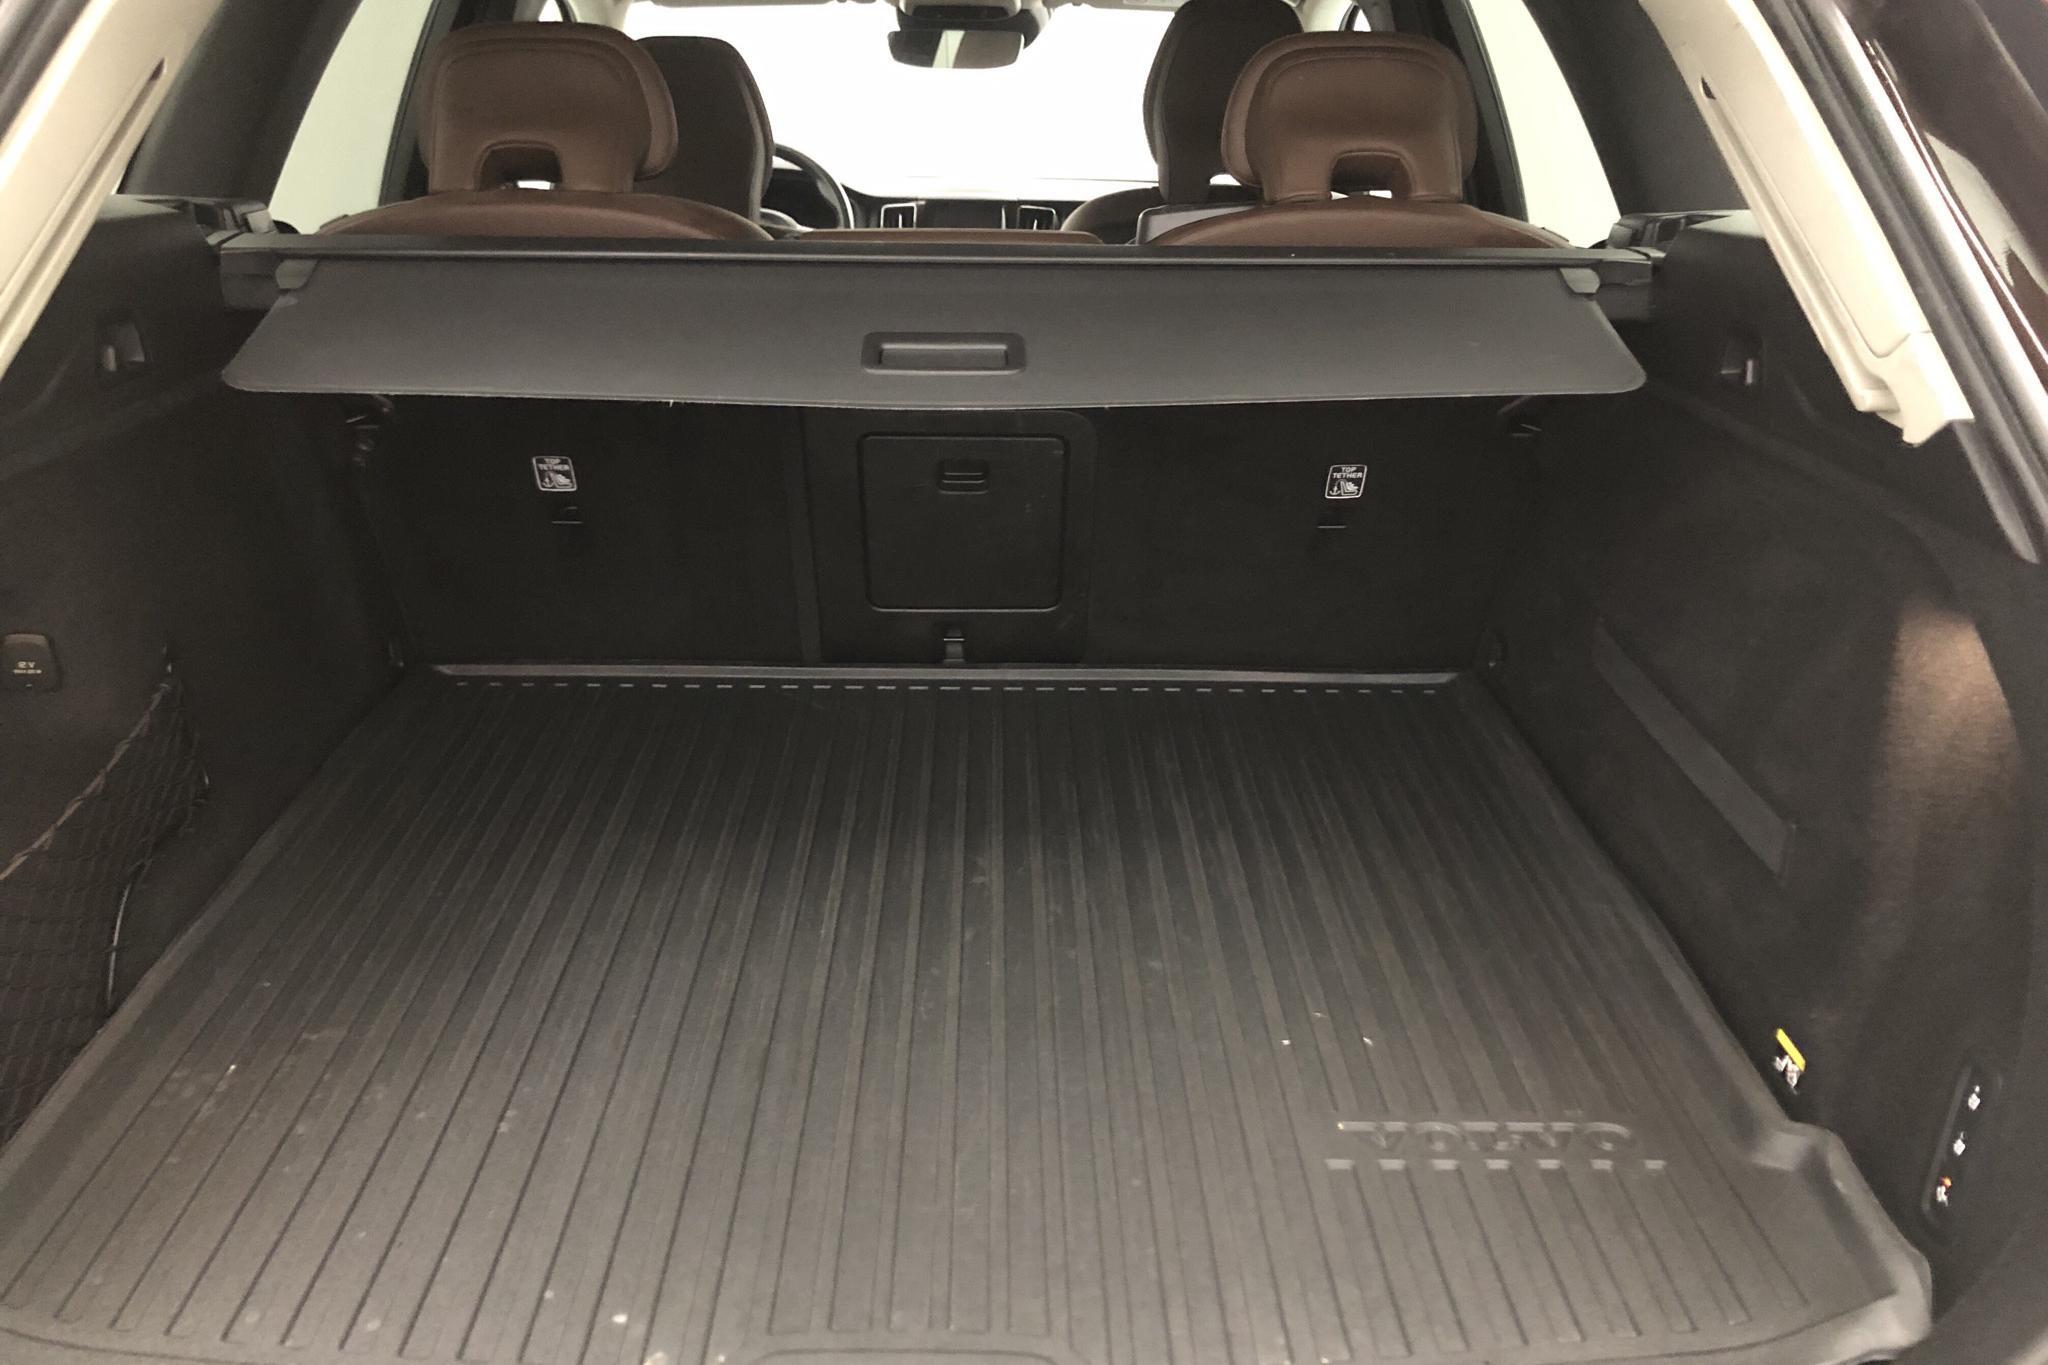 Volvo XC60 D4 AWD (190hk) - 71 180 km - Automatic - Dark Brown - 2019